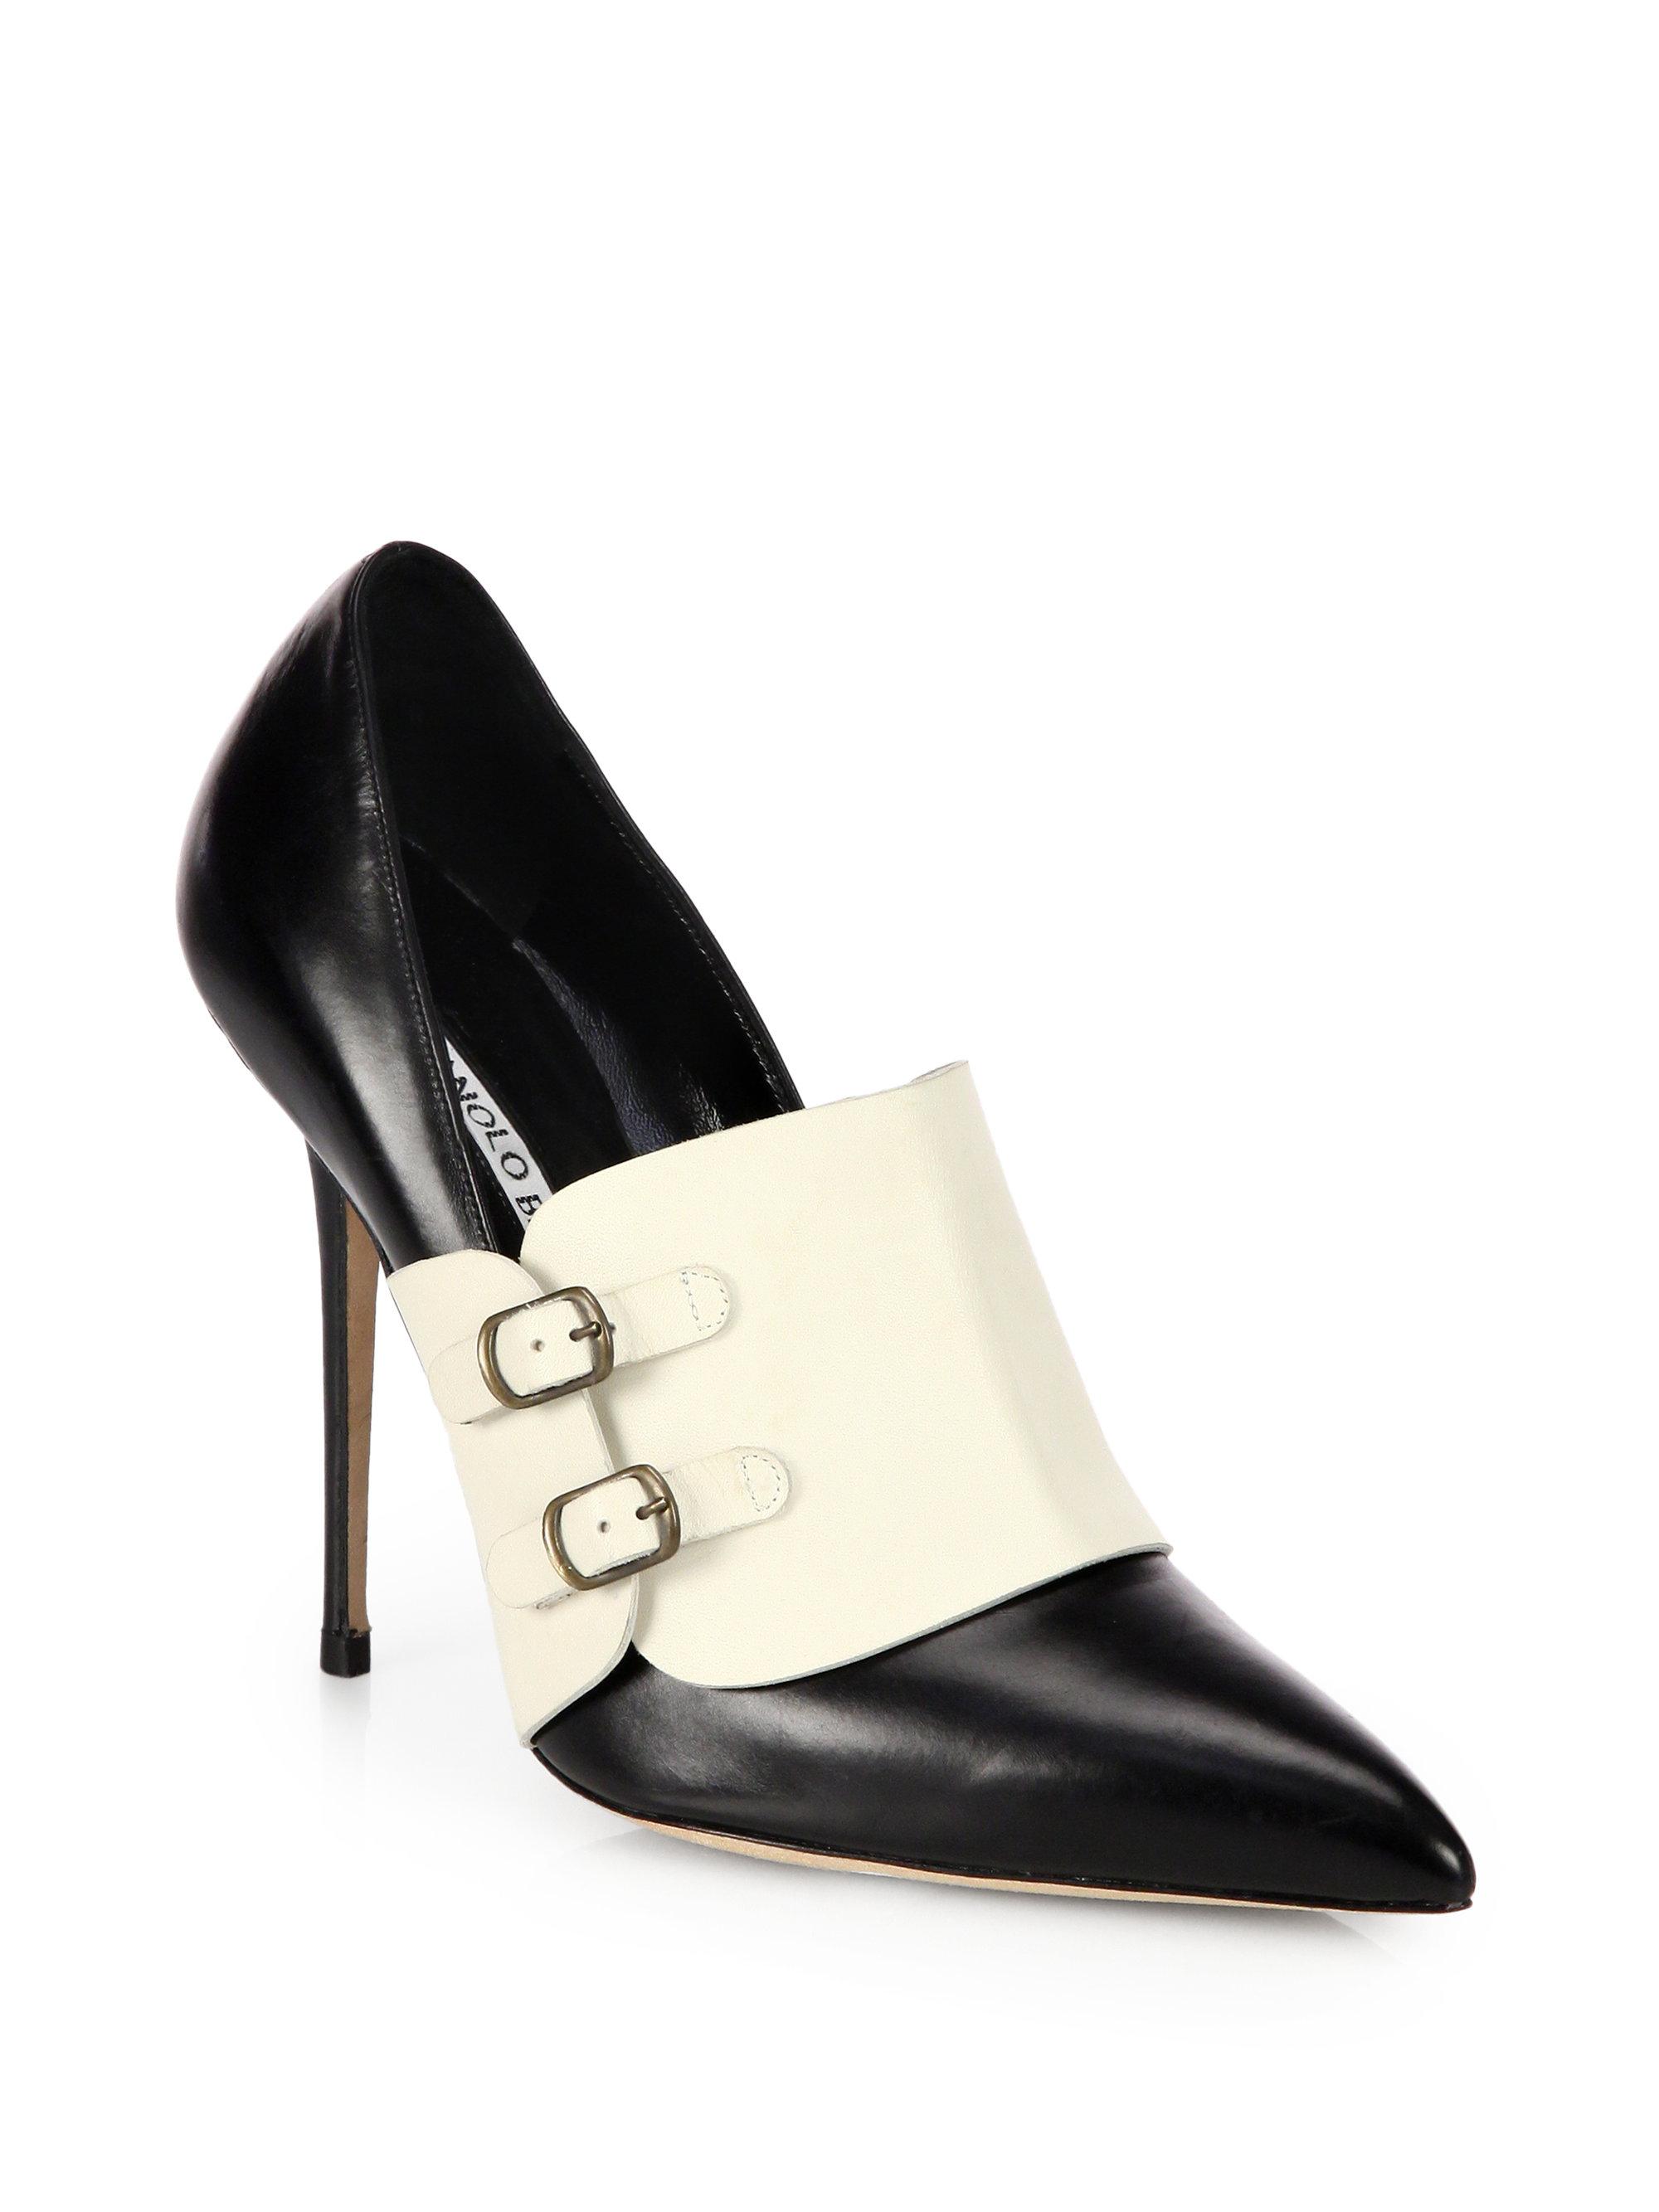 Lyst manolo blahnik encajada leather buckle pumps in black for Shoes by manolo blahnik